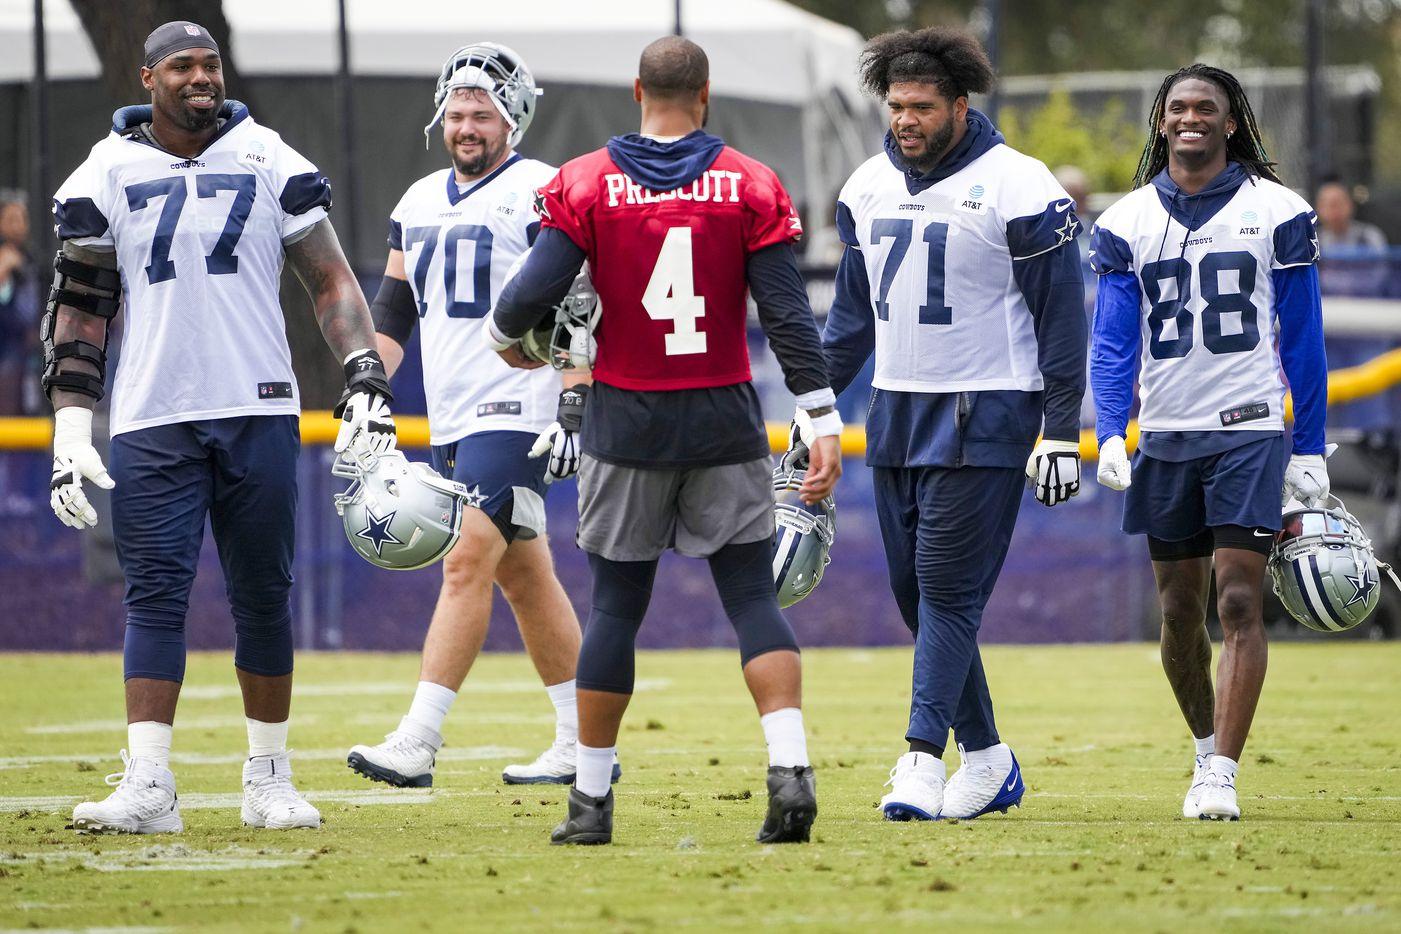 Dallas Cowboys quarterback Dak Prescott (4) talks with tackle Tyron Smith (77), guard Zack Martin (70), tackle La'el Collins (71) and wide receiver CeeDee Lamb (88) between drills during a practice at training camp on Saturday, July 24, 2021, in Oxnard, Calif.